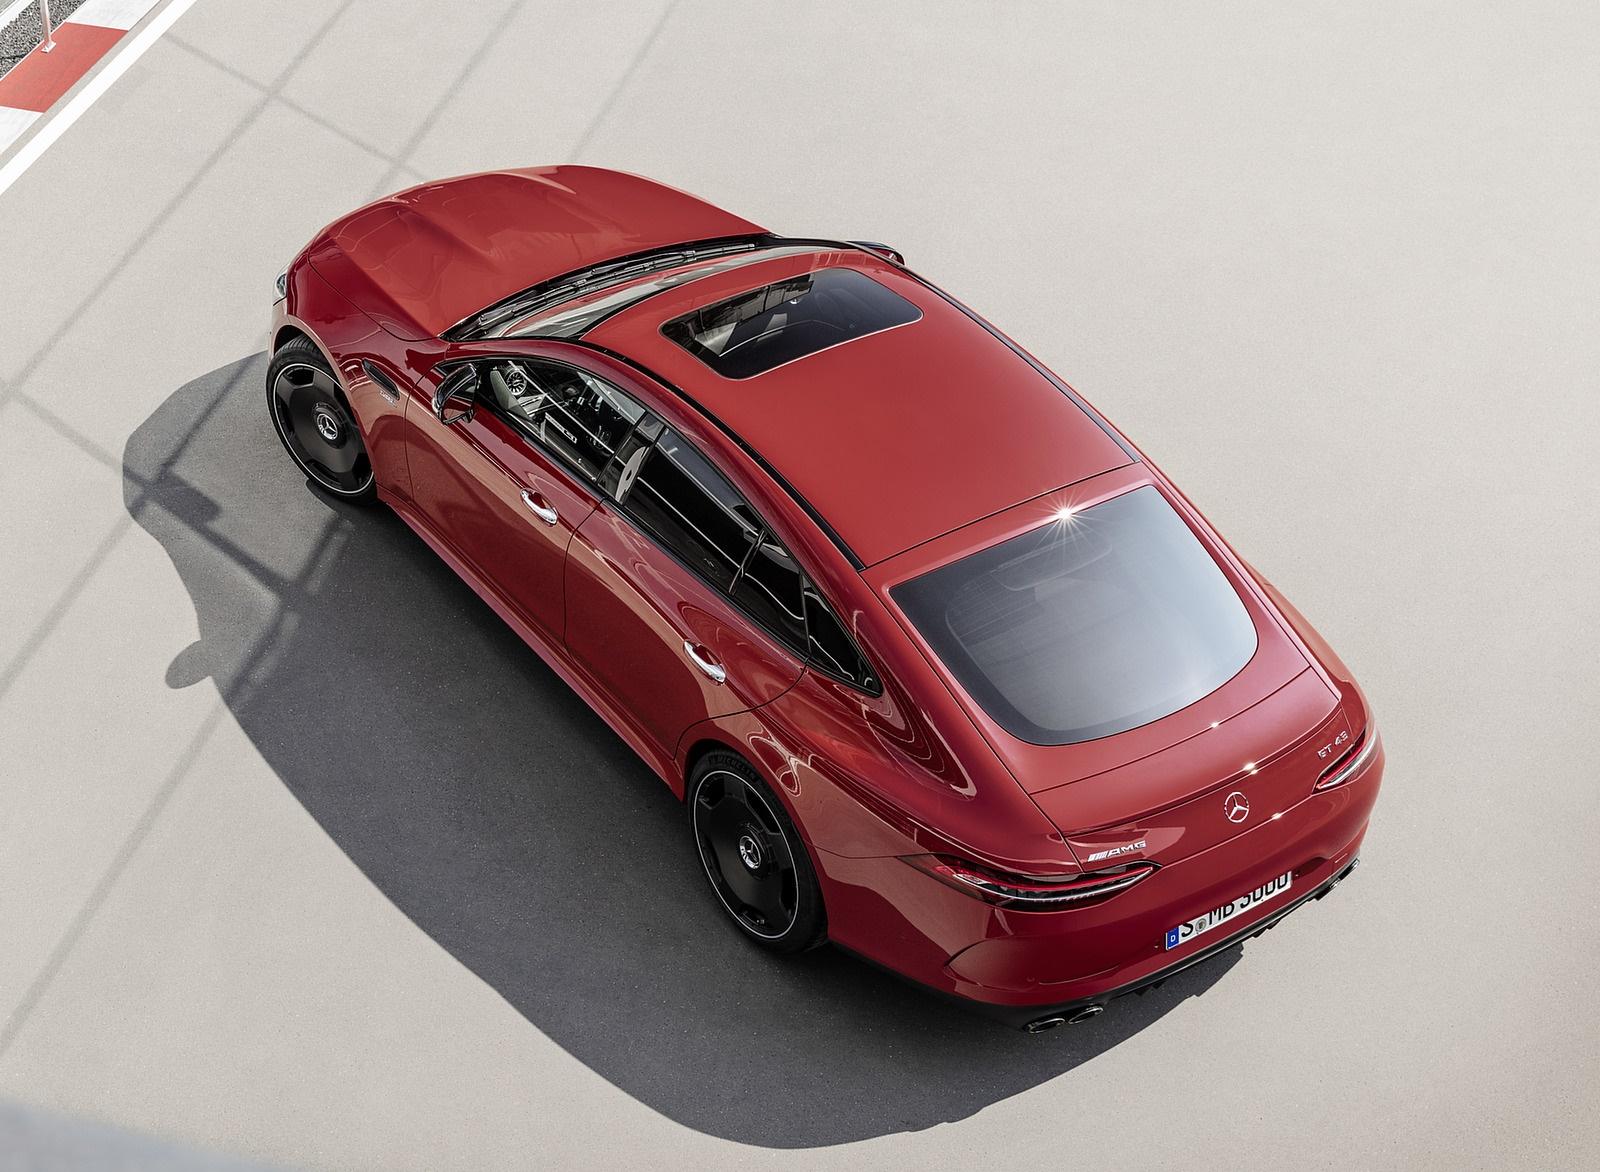 2019 Mercedes-AMG GT 43 4MATIC+ 4-Door Coupé (Color: Jupiter Red) Top Wallpapers (7)